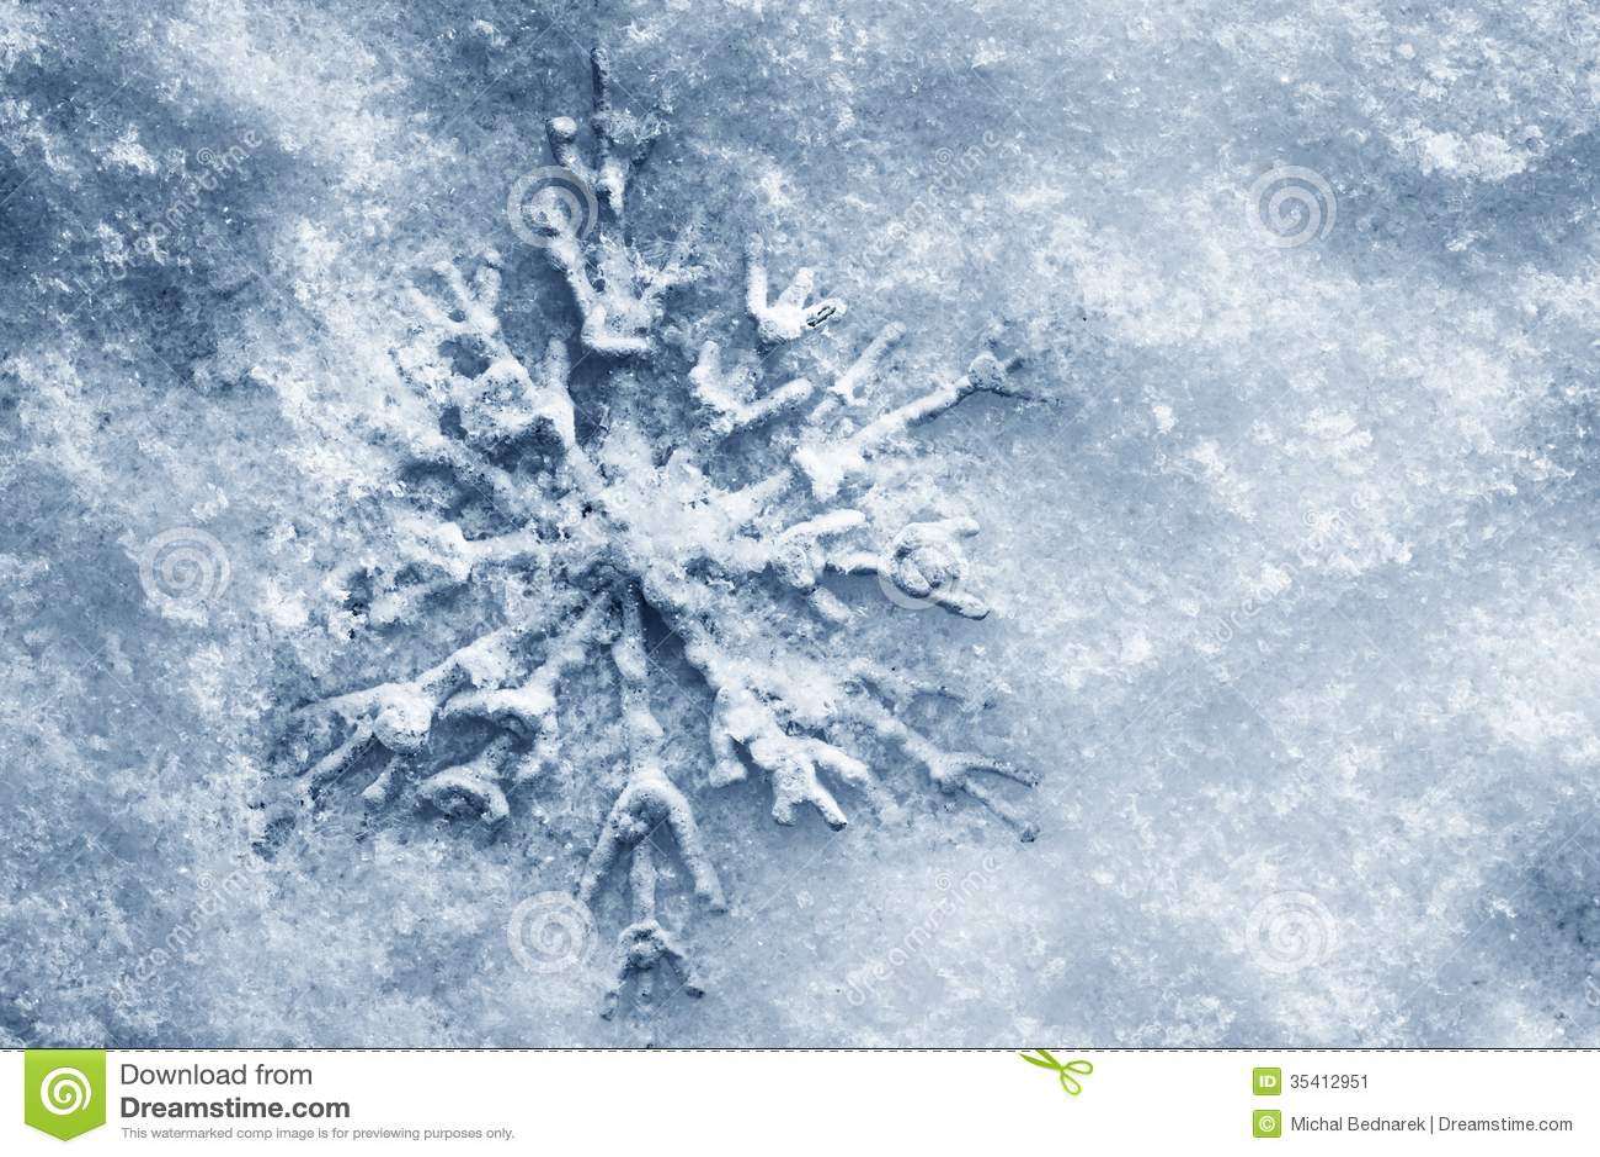 Winter, Christmas Background. Snowflake On Snow Stock Image ...